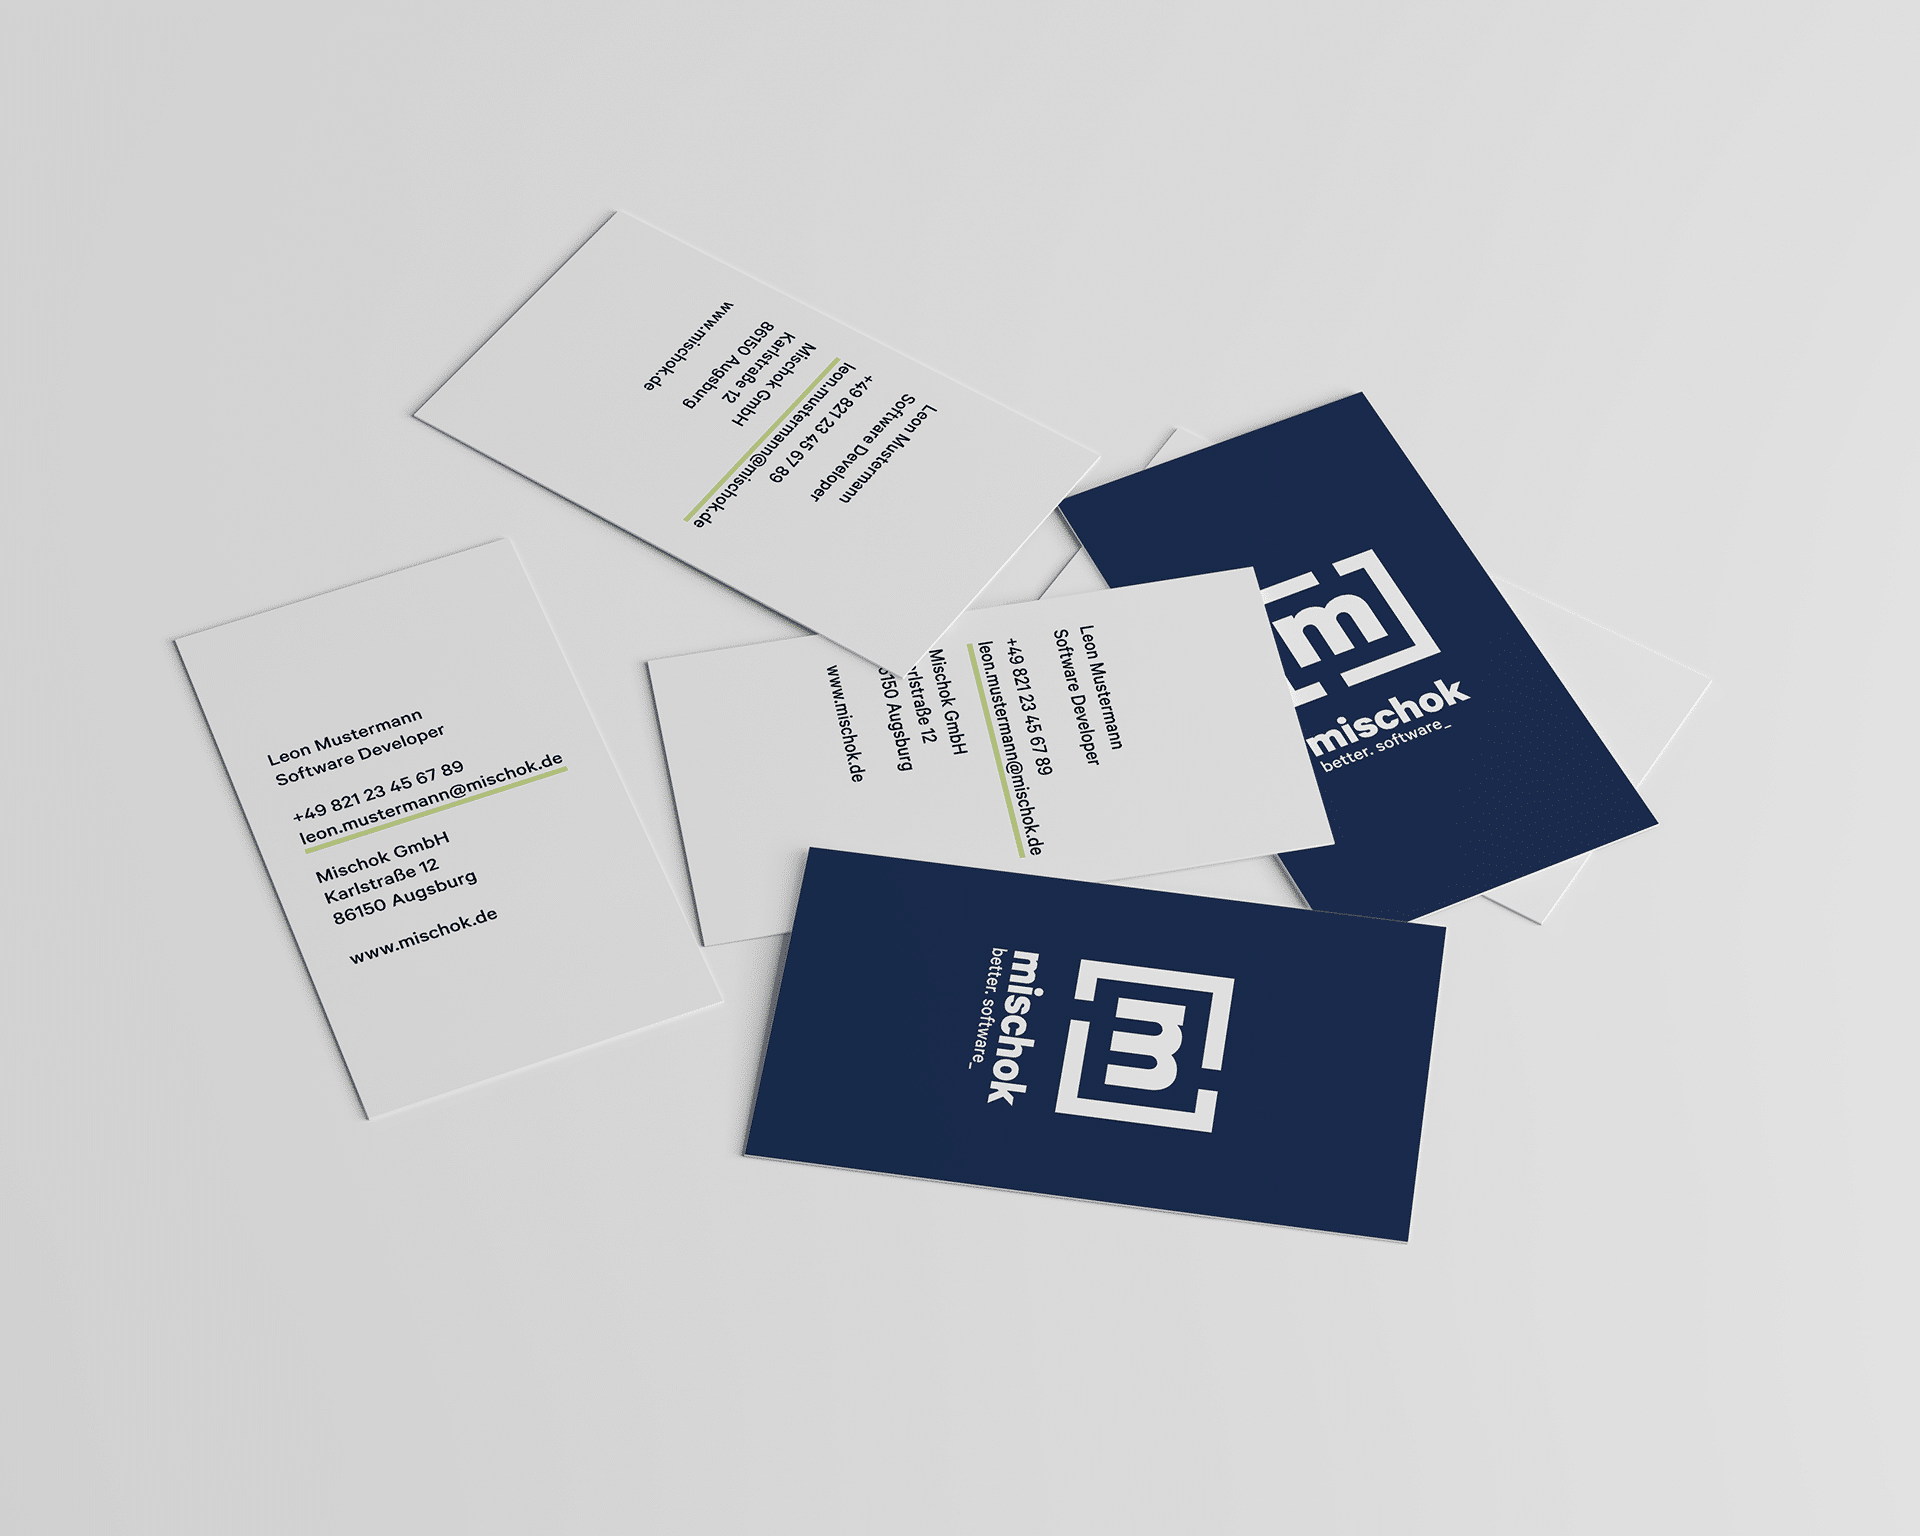 Mischok Corporate Design